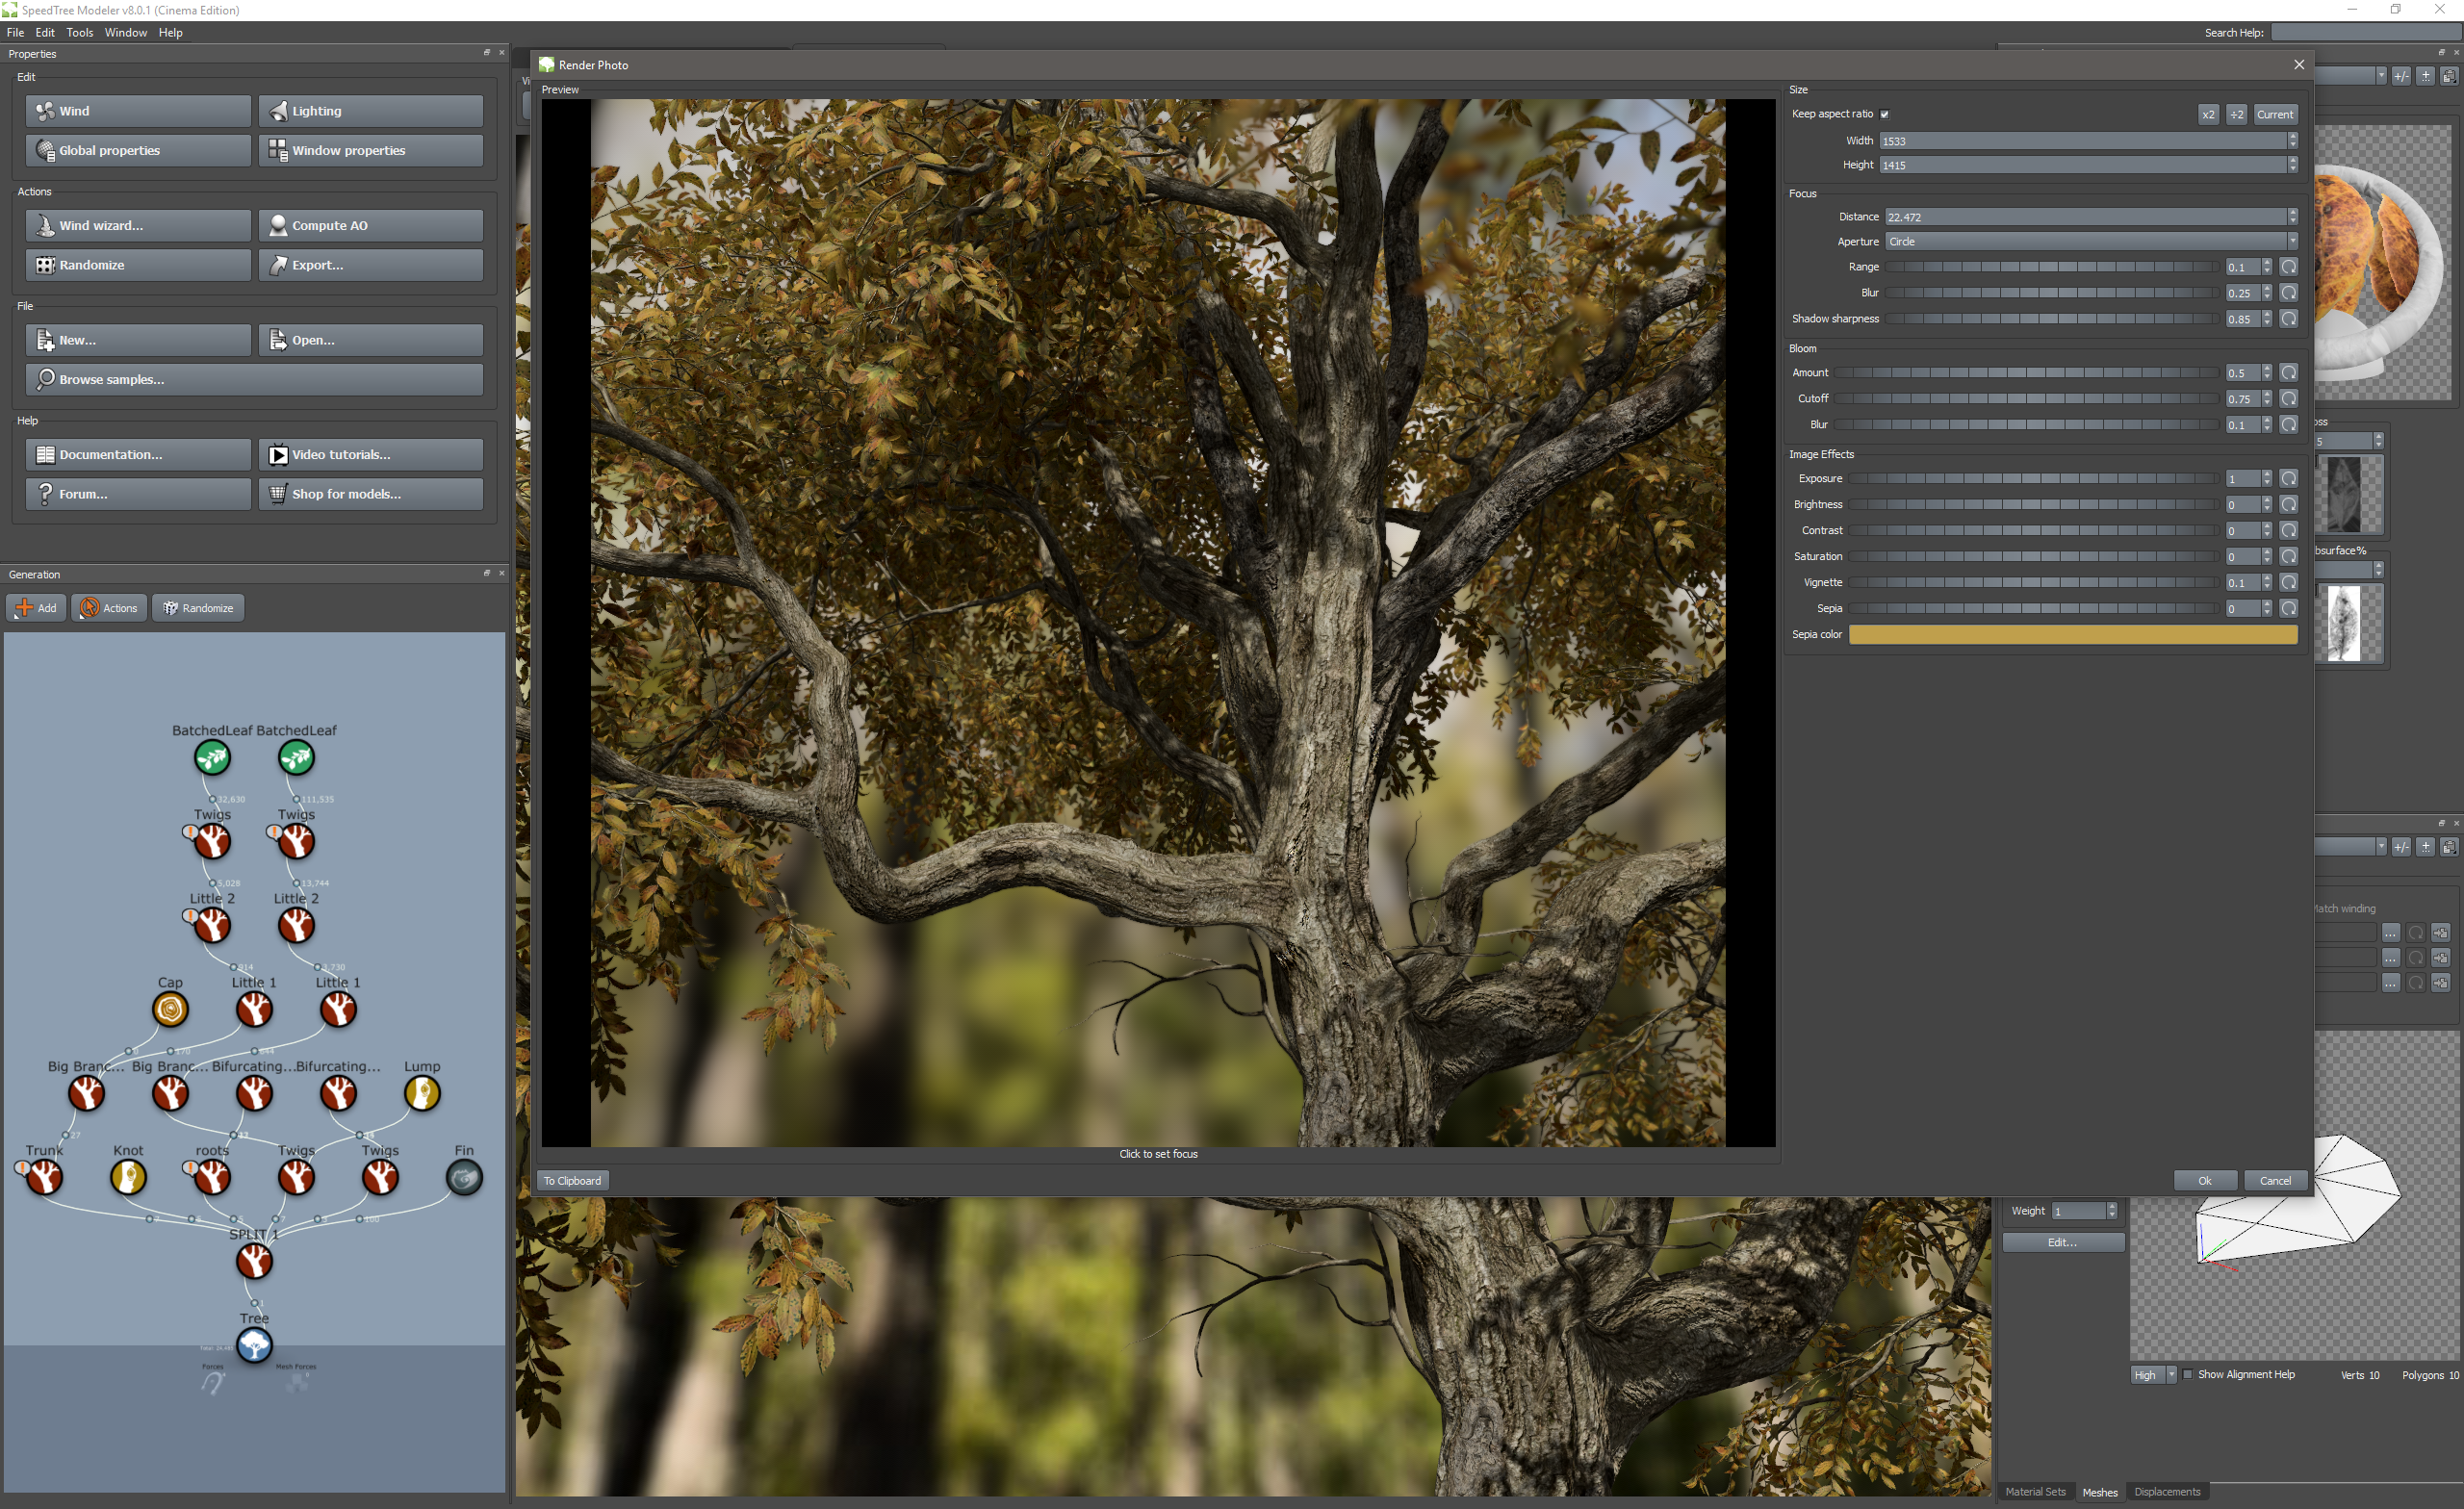 modeler_window_6 (renderphoto)